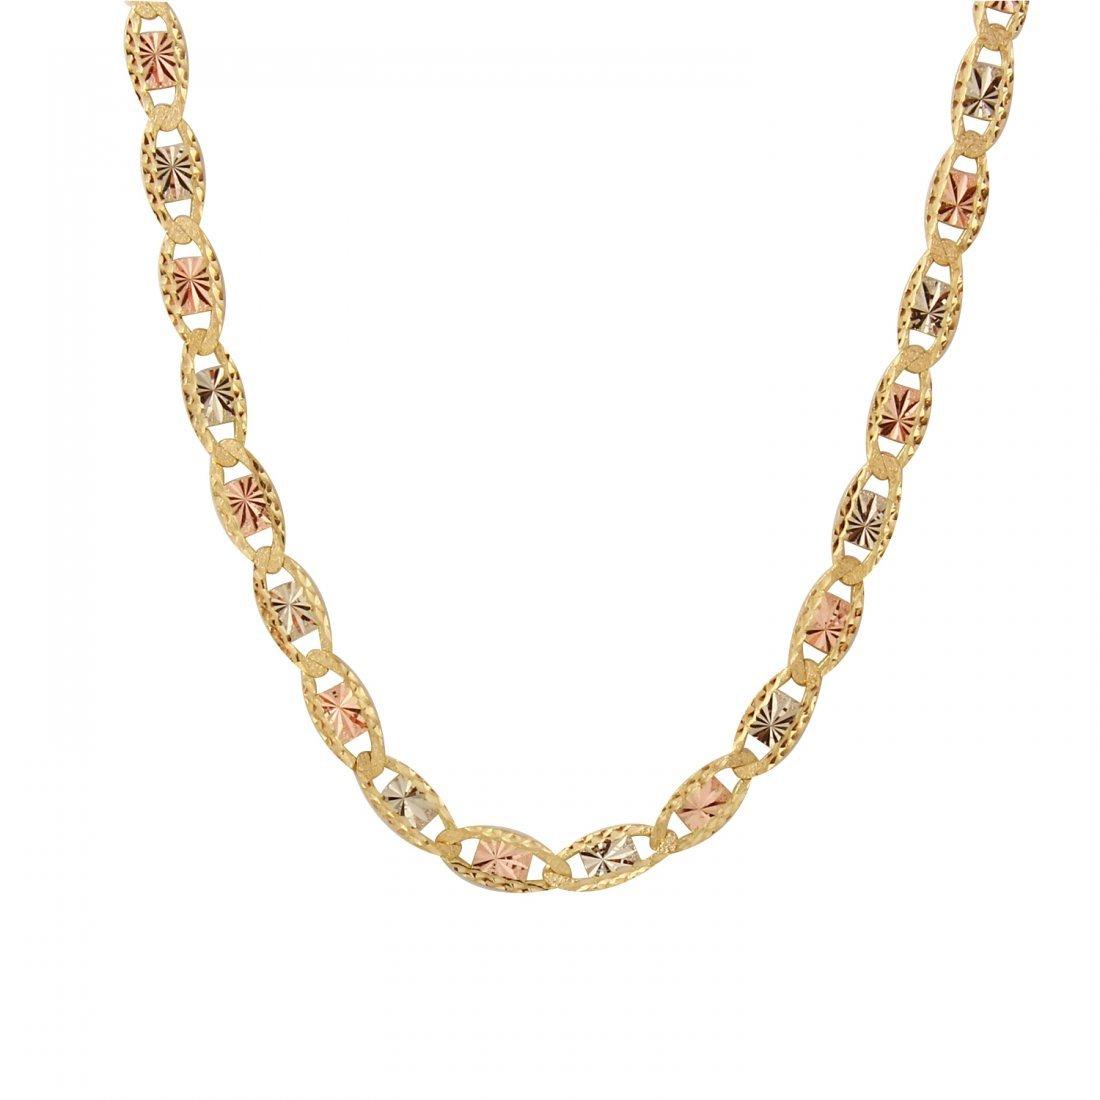 Ladies 10K Three tone Gold Necklace